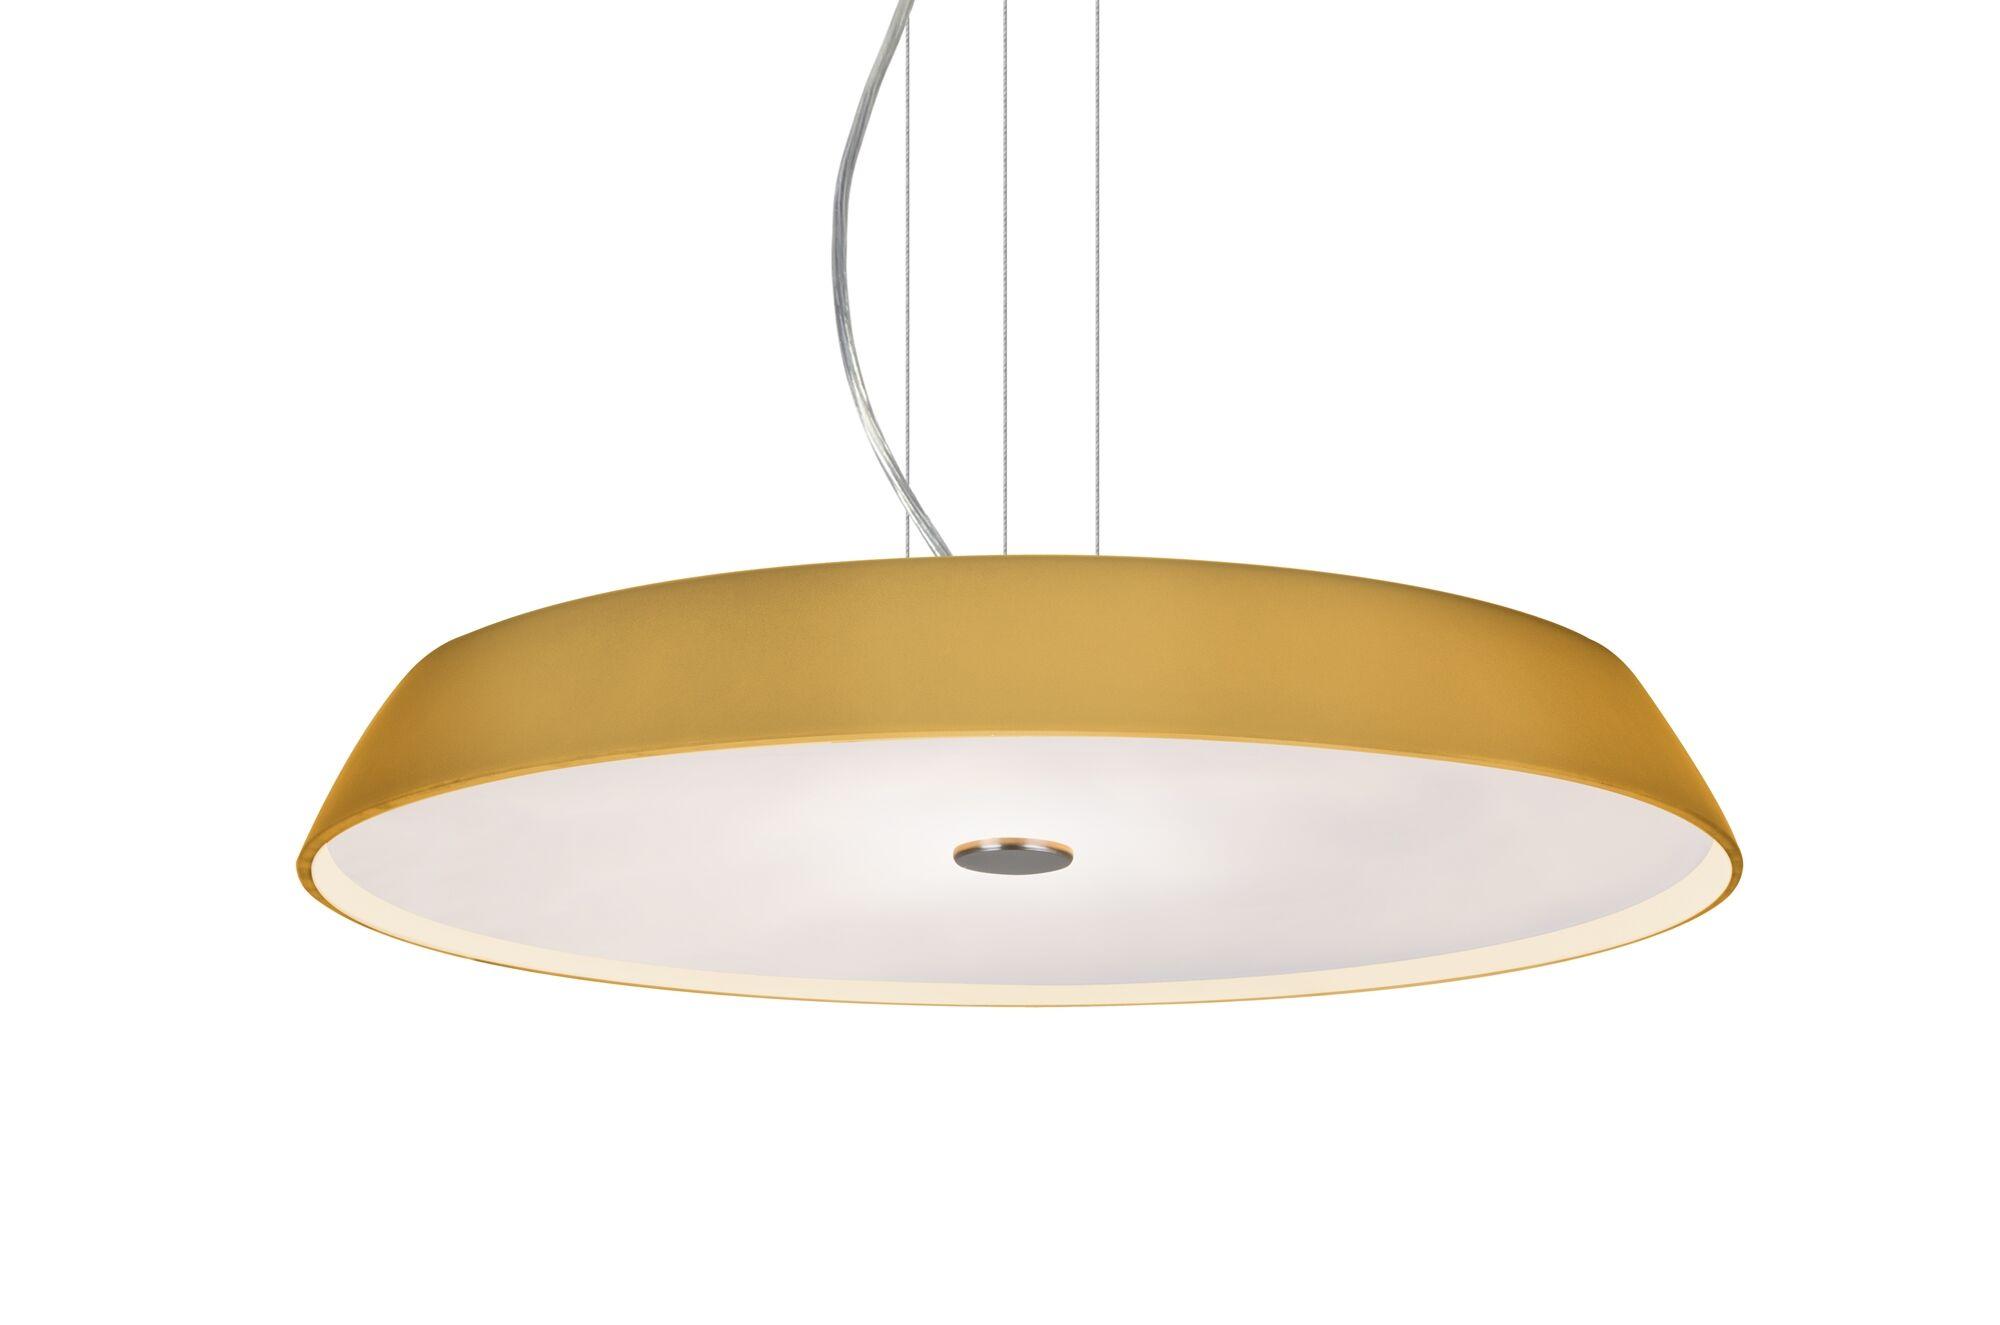 Speier Round Suspension 1-Light  LED  Pendant Shade Color: Amber, Finish: Satin Nickel